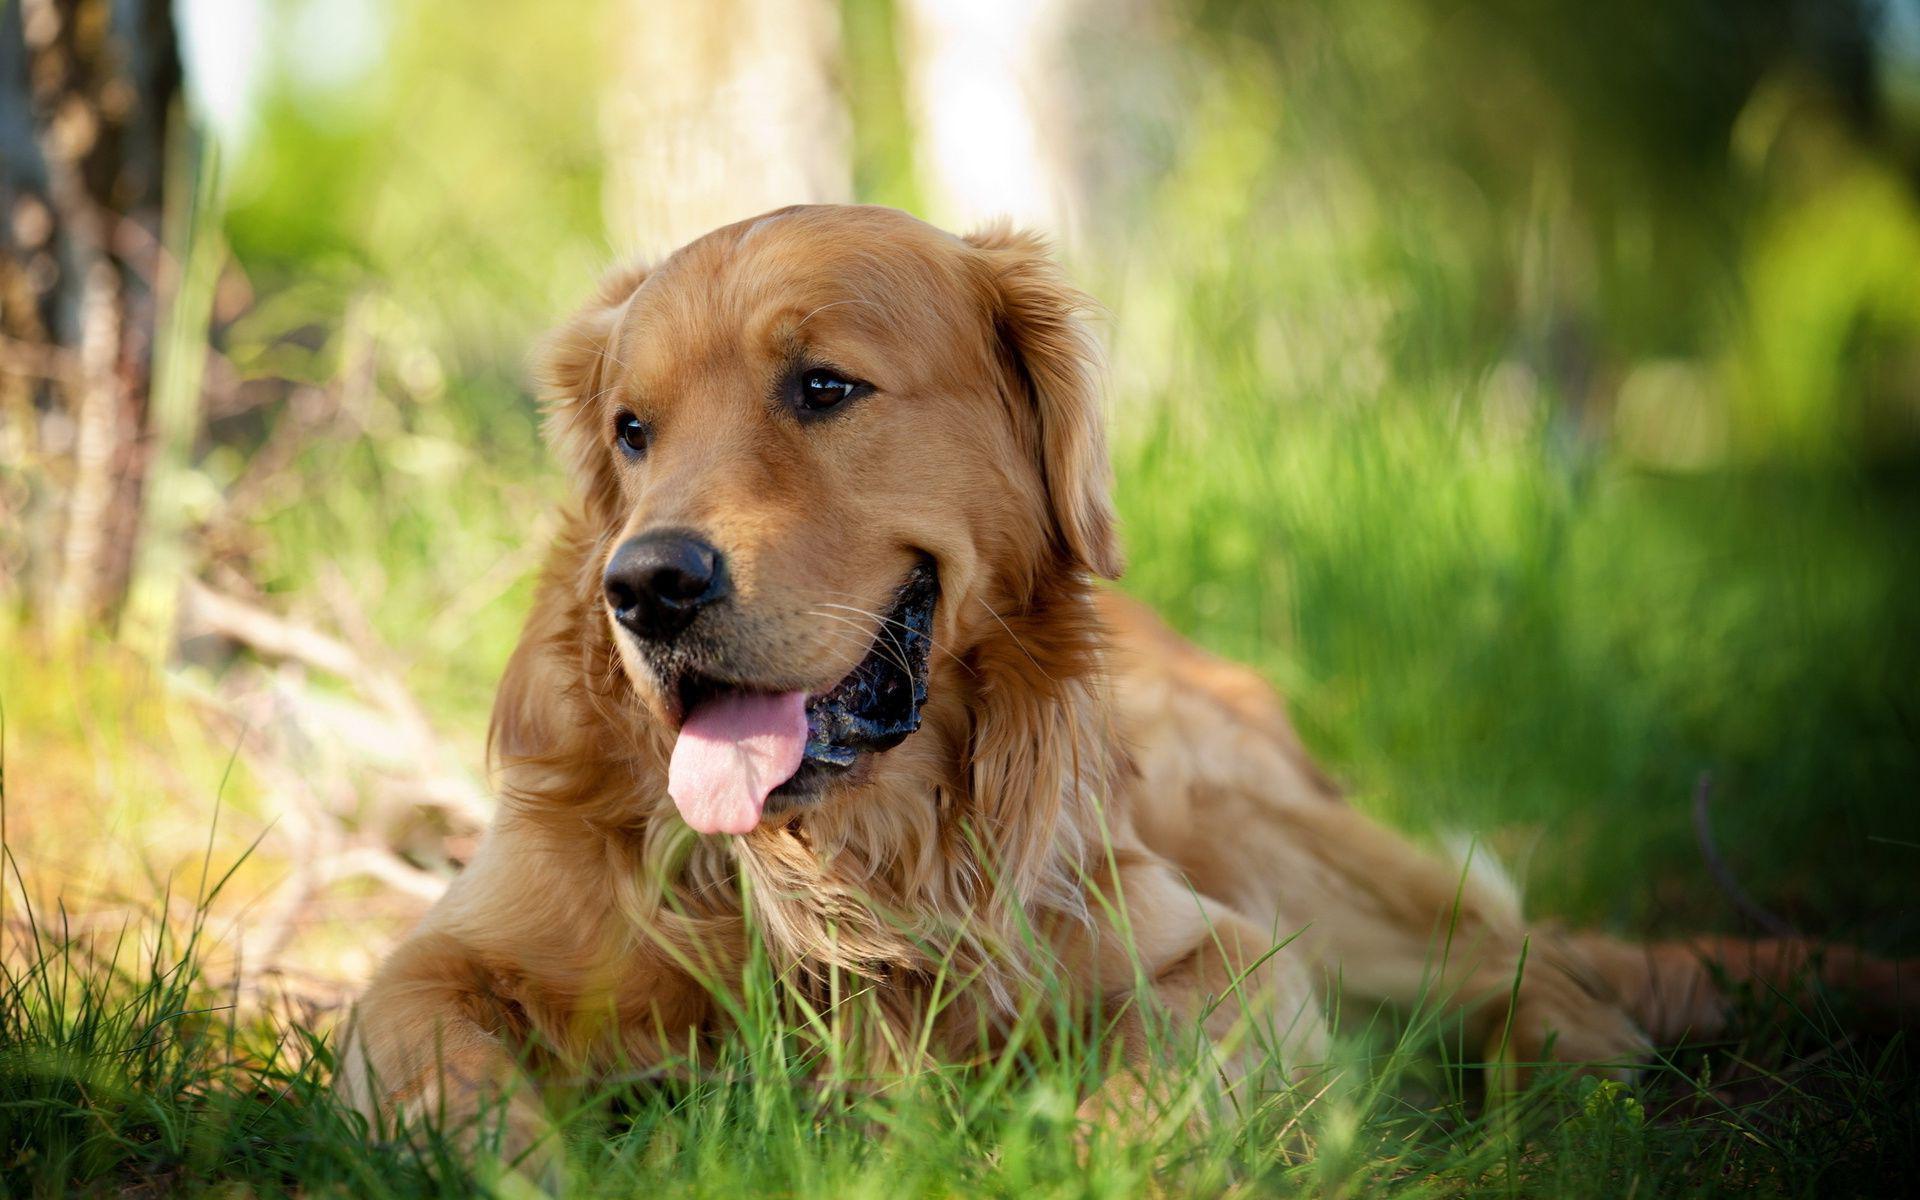 Puppies And Fall Wallpaper 30 Hd Golden Retriever Dog Wallpapers